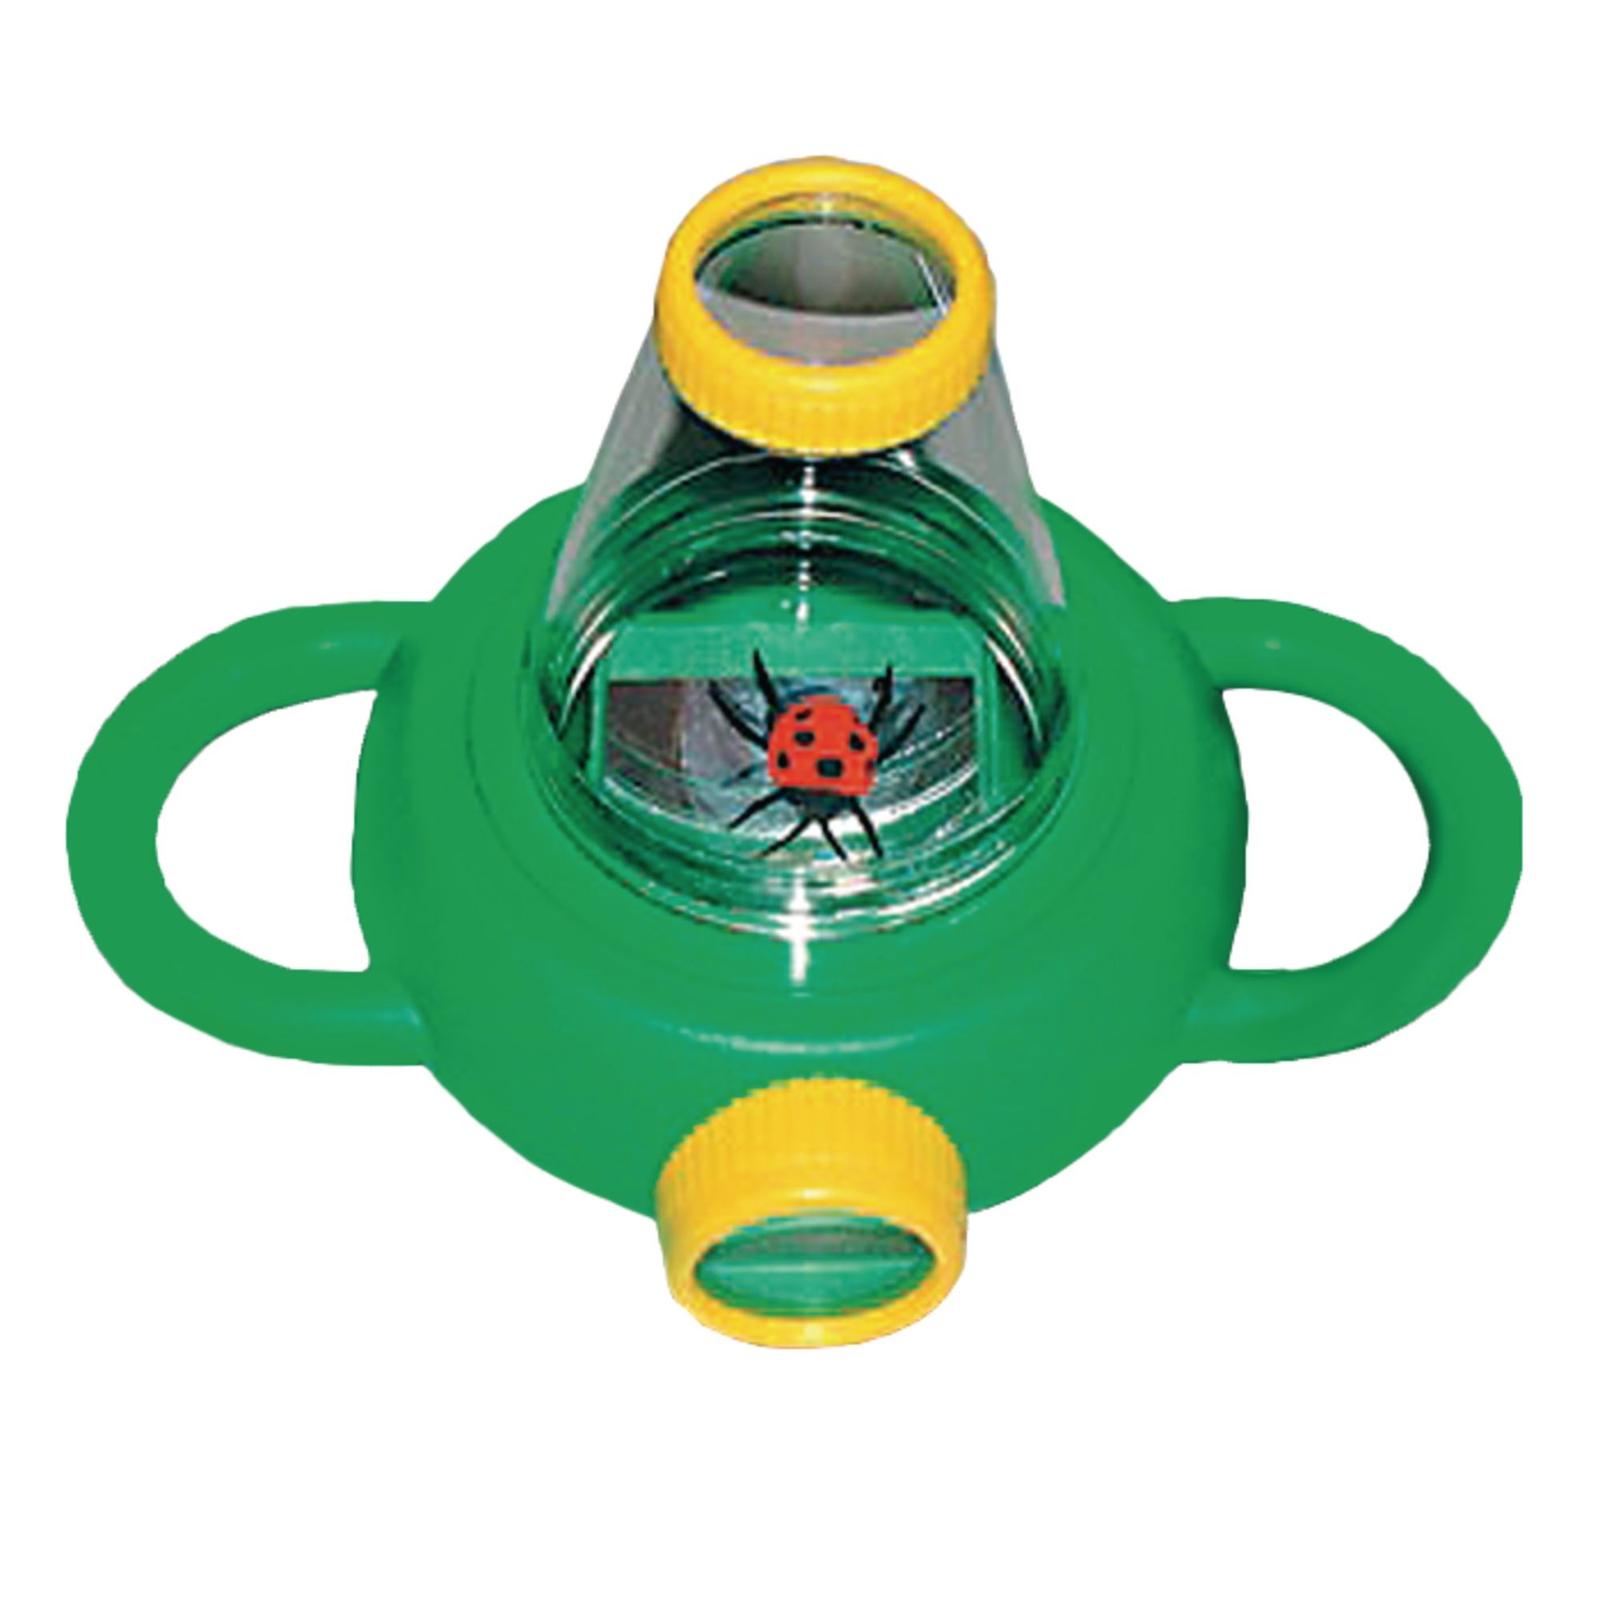 2 Way Magnifier